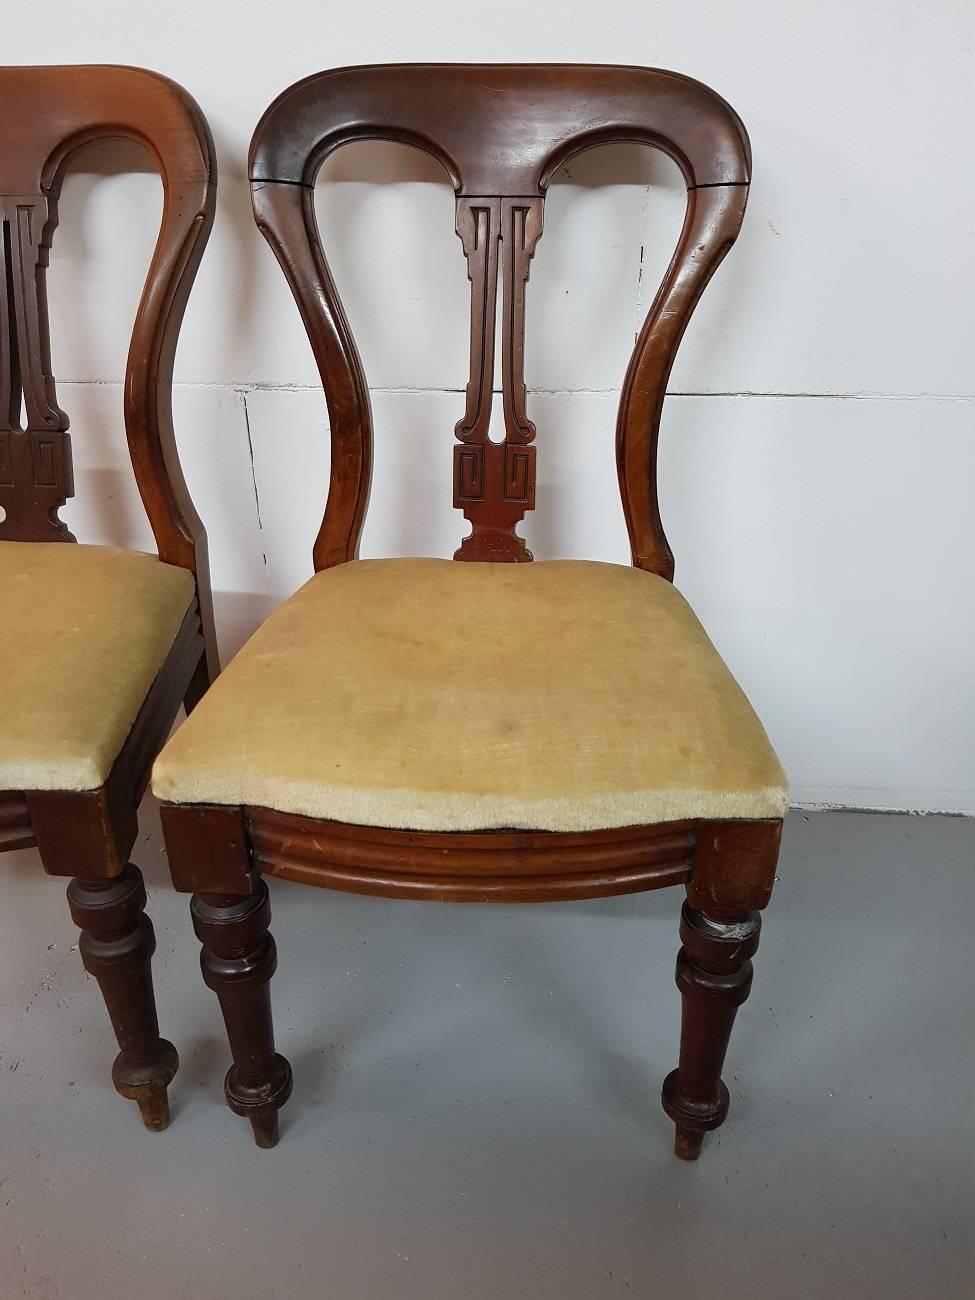 Late 19th Century English Mahogany Victorian Balloon Back Chairs At 1stdibs